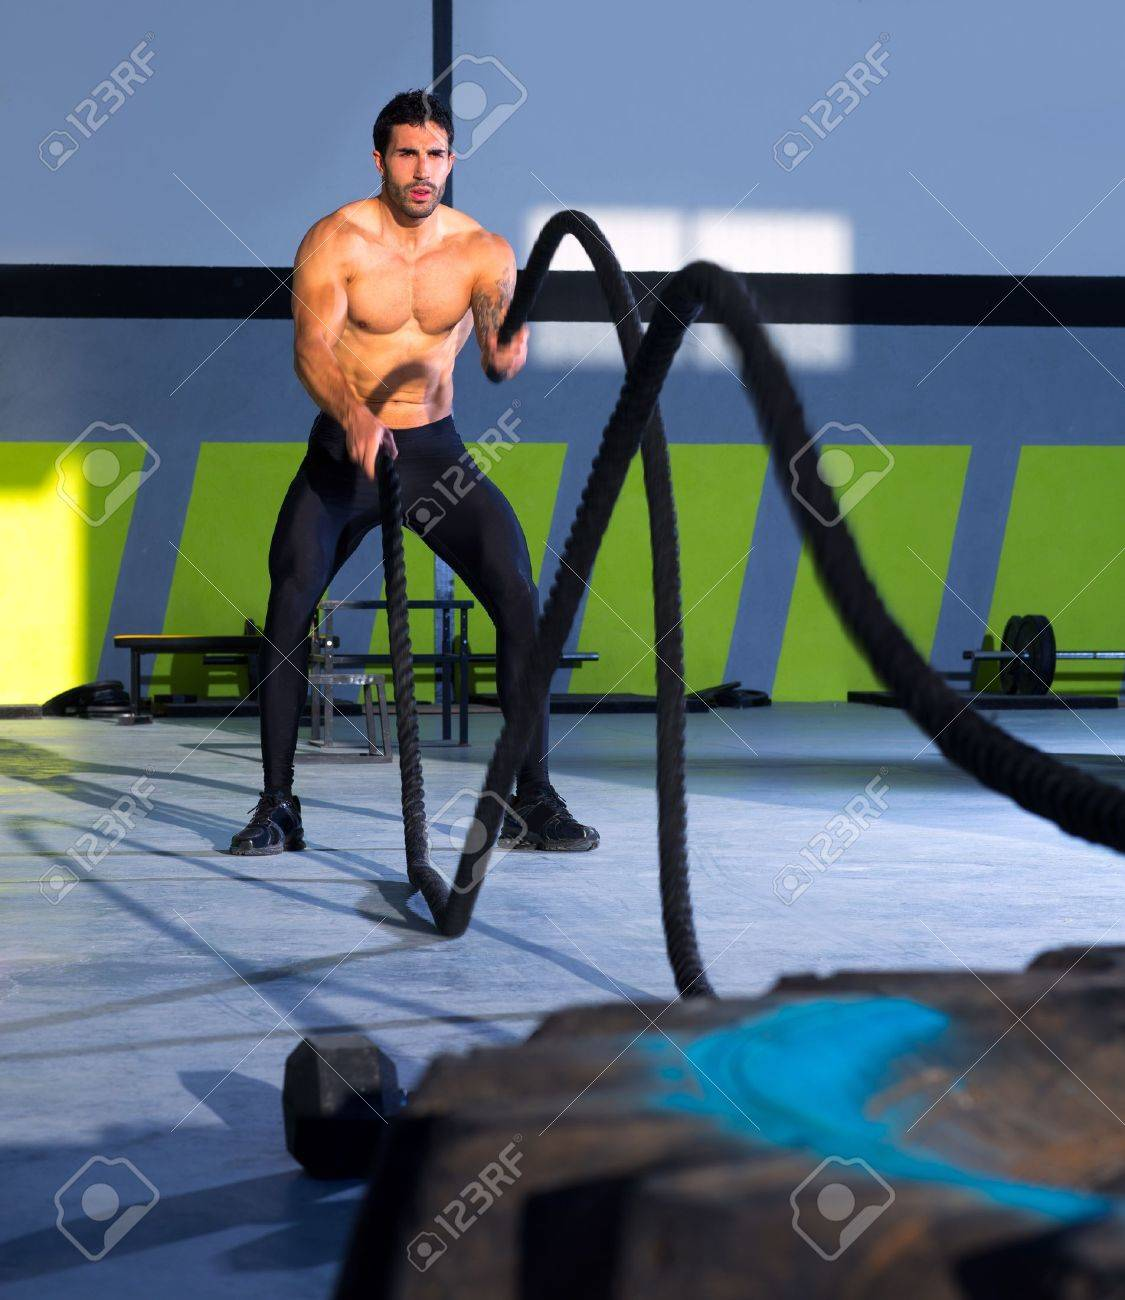 Crossfit battling ropes at gym workout from big tires Standard-Bild - 17050623